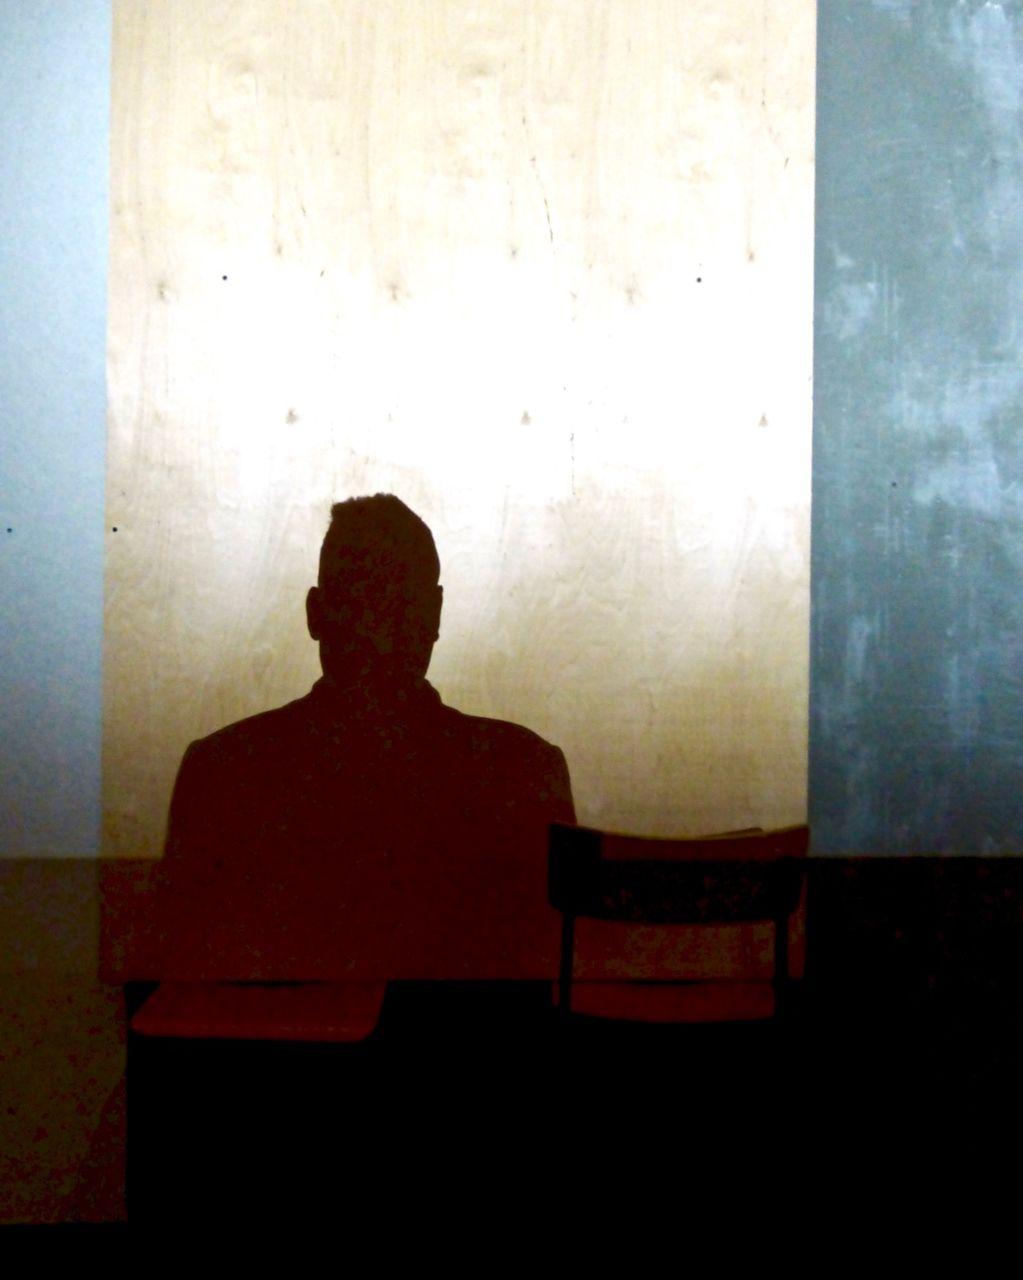 Self Portrait on William Kentridge 2018